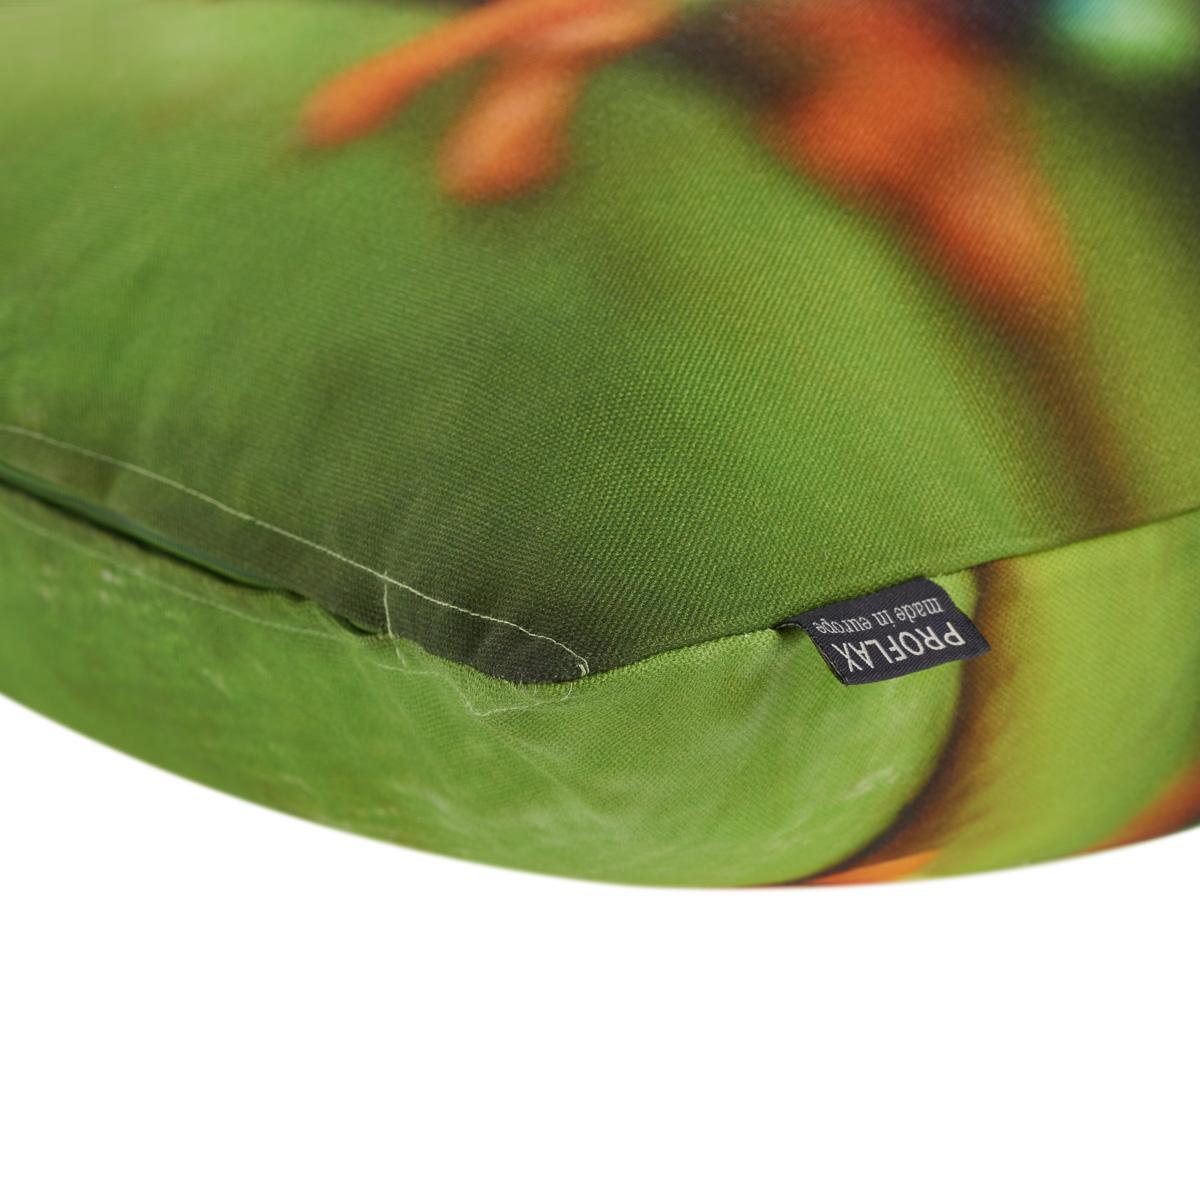 PROFLAX Kissenhülle Froggy, Motiv Frosch, Digitaldruck, 40x40cm, 100% Baumwolle